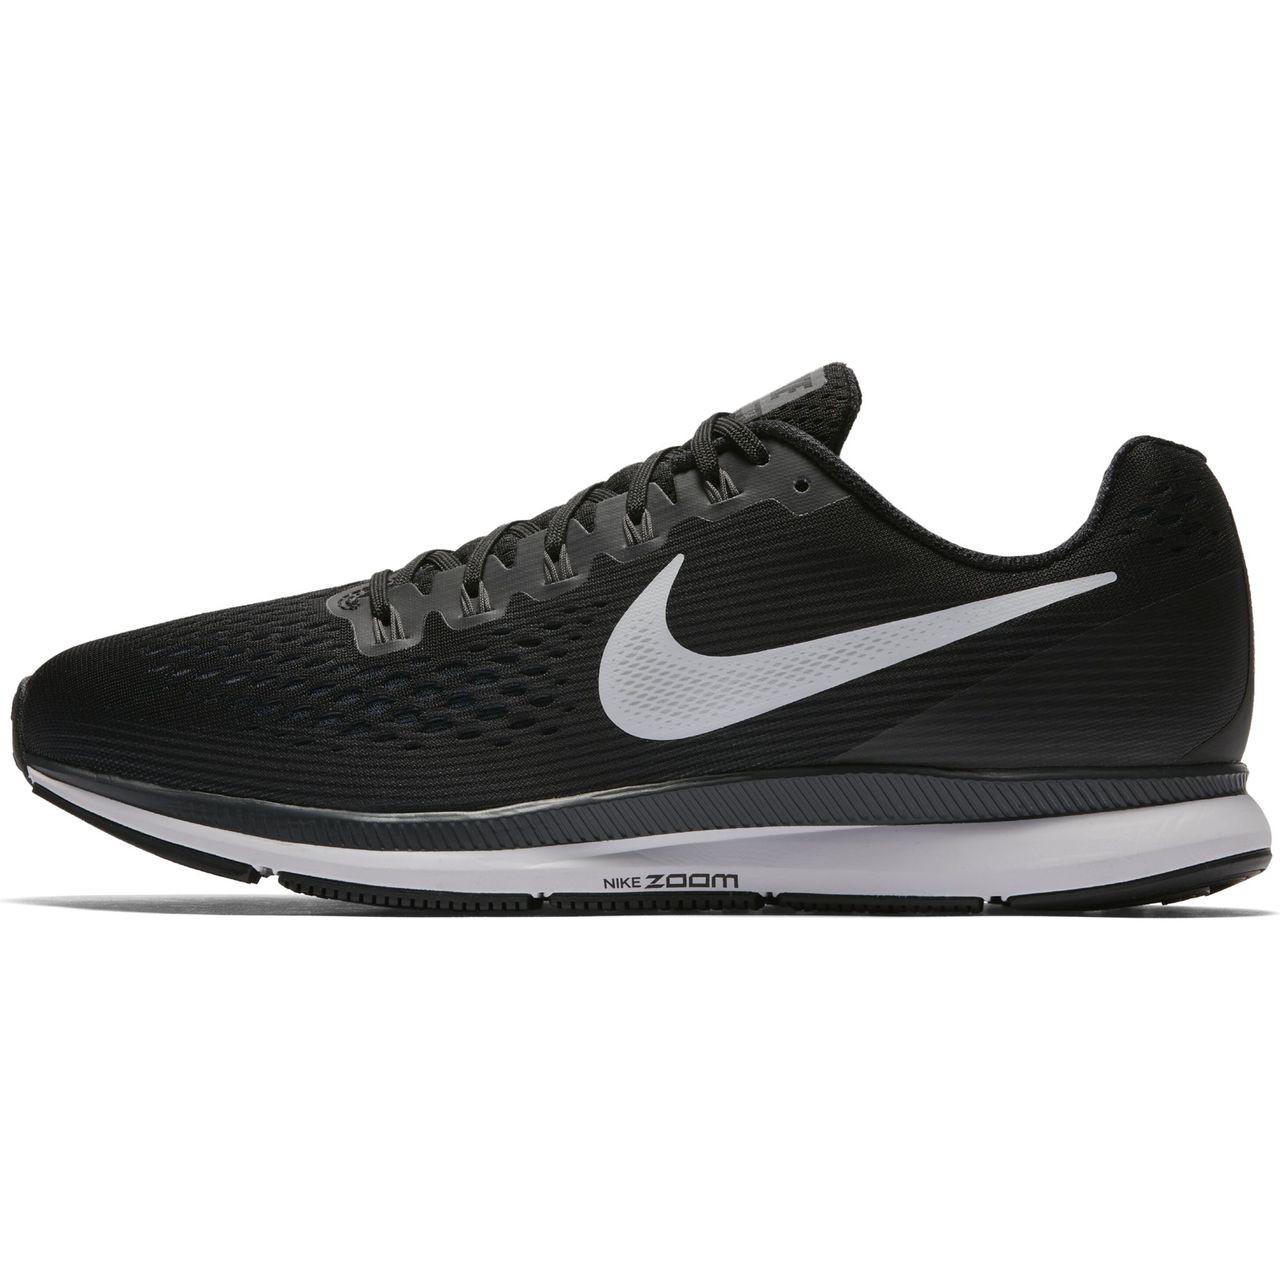 Convencional Espolvorear Poner a prueba o probar  Nike Men's Air Zoom Pegasus 34 - Black/White